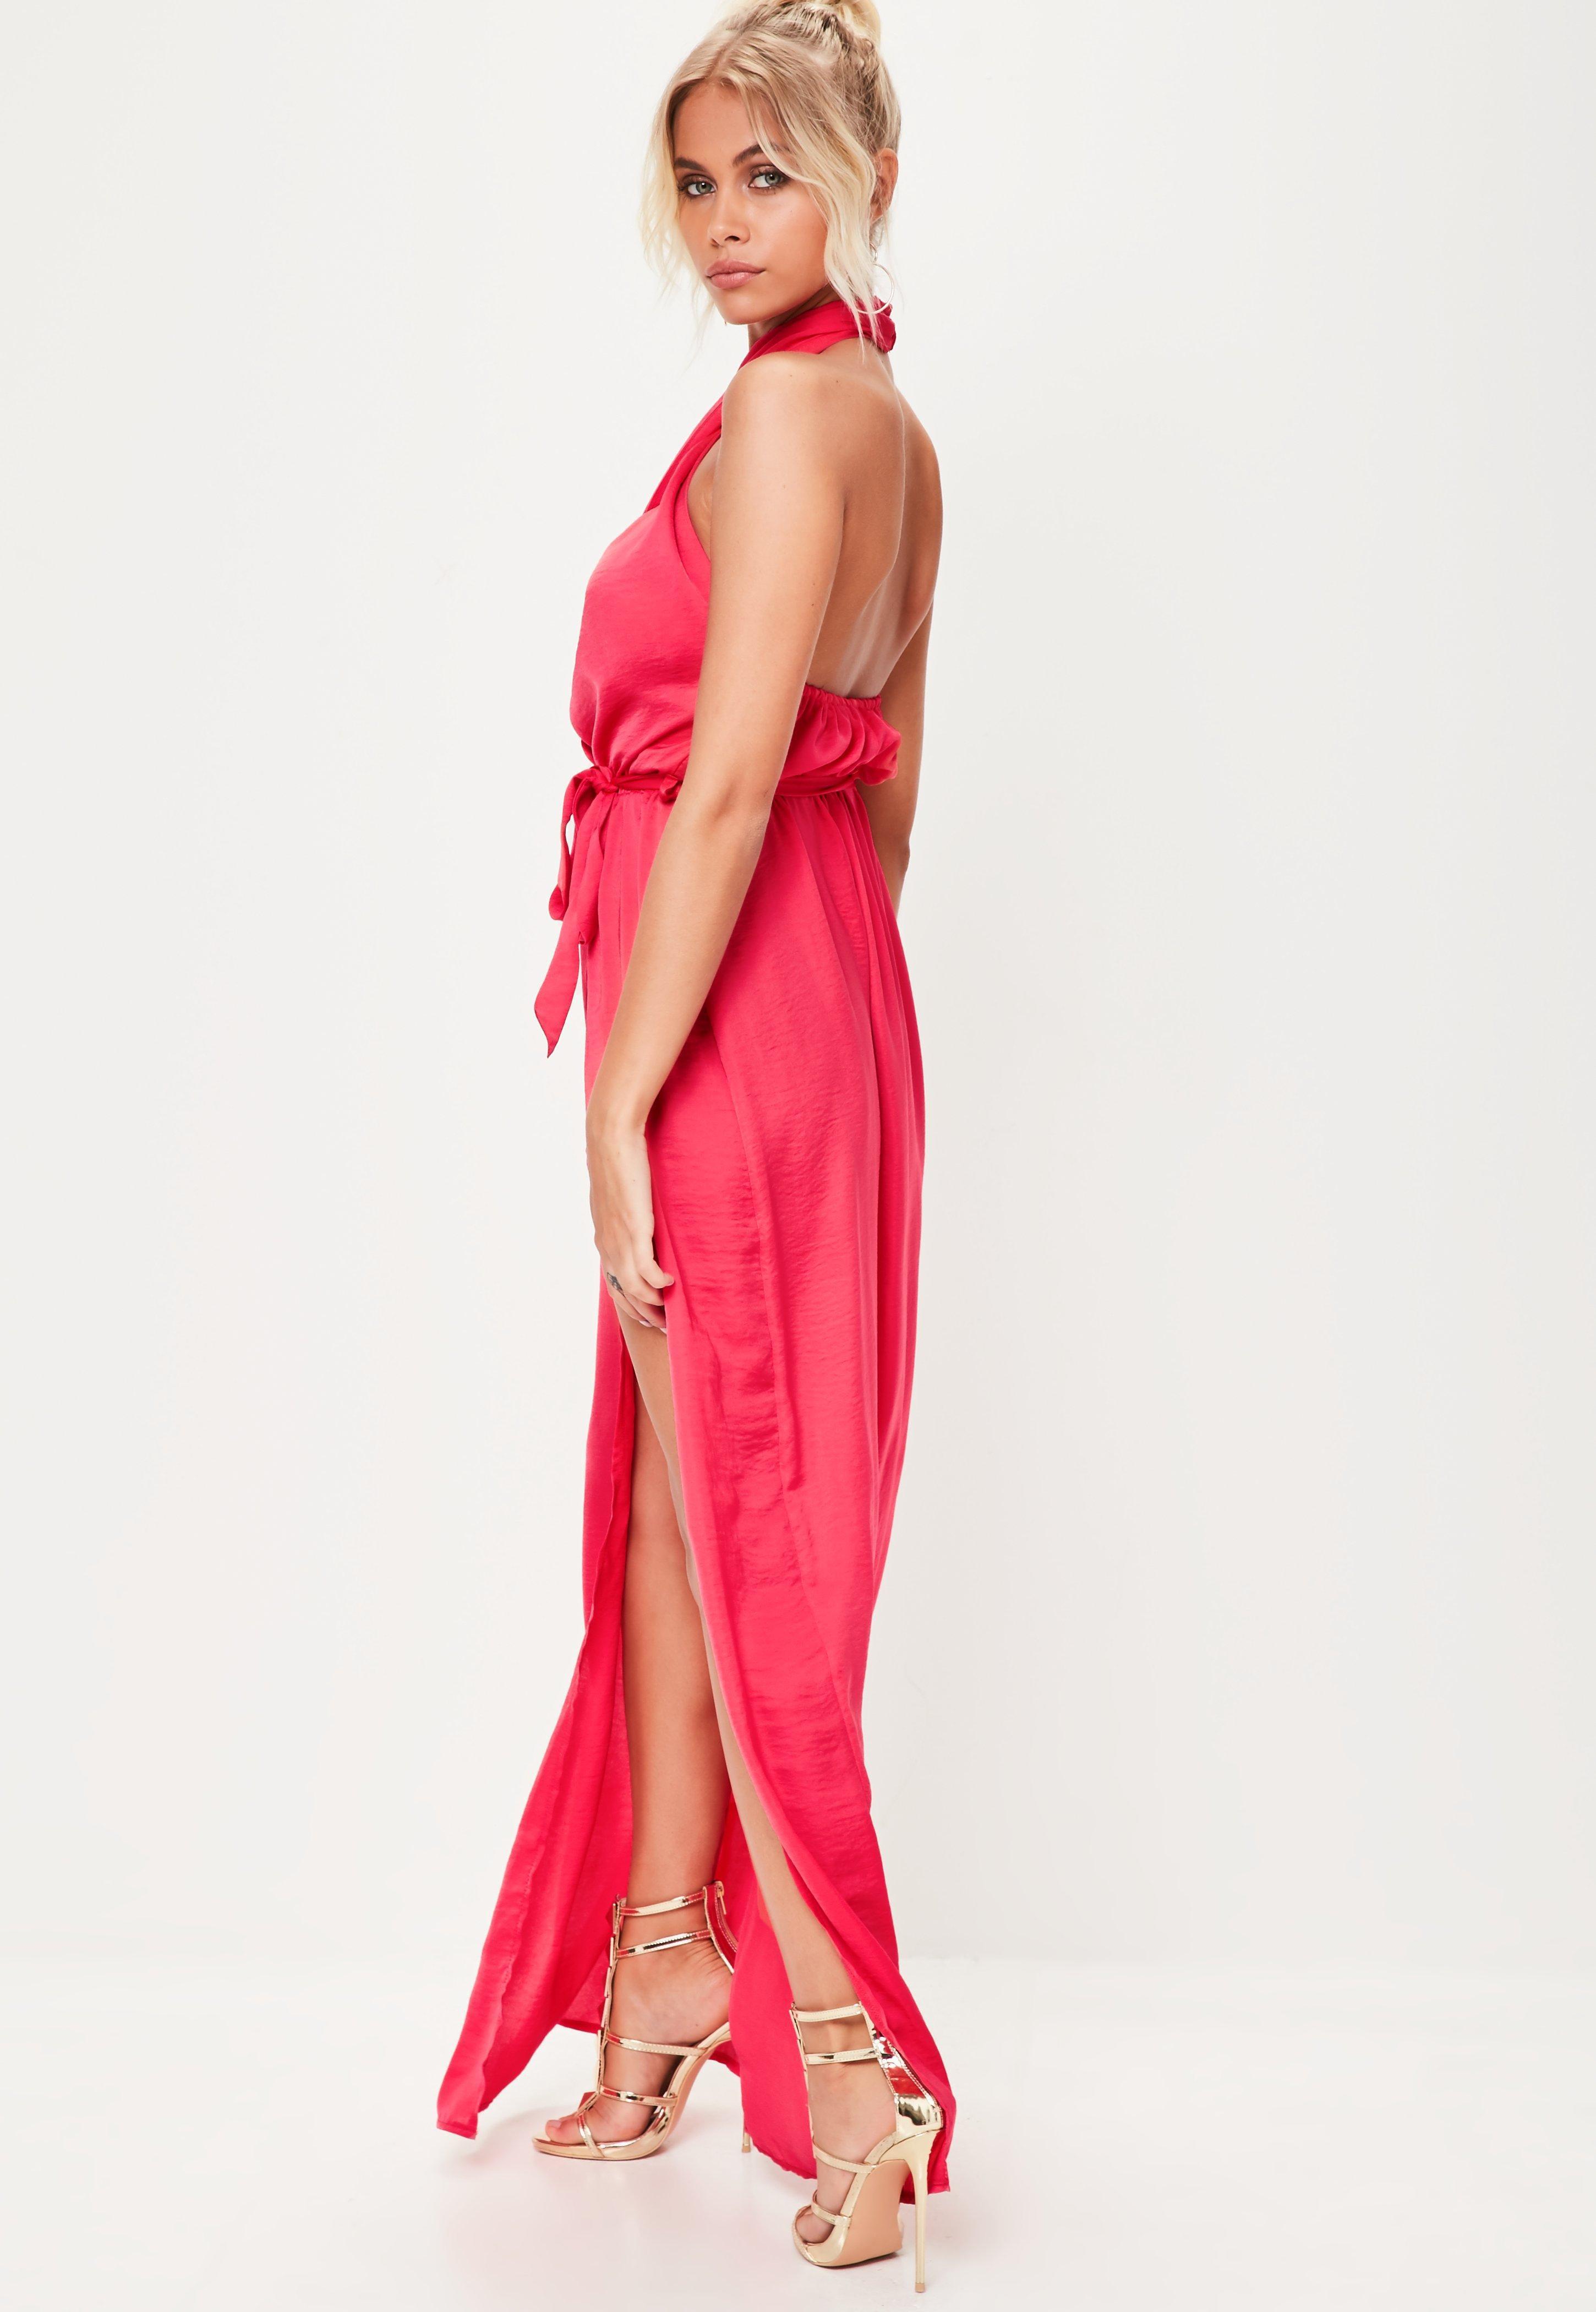 Lyst - Missguided Pink Satin Twist Maxi Dress in Pink